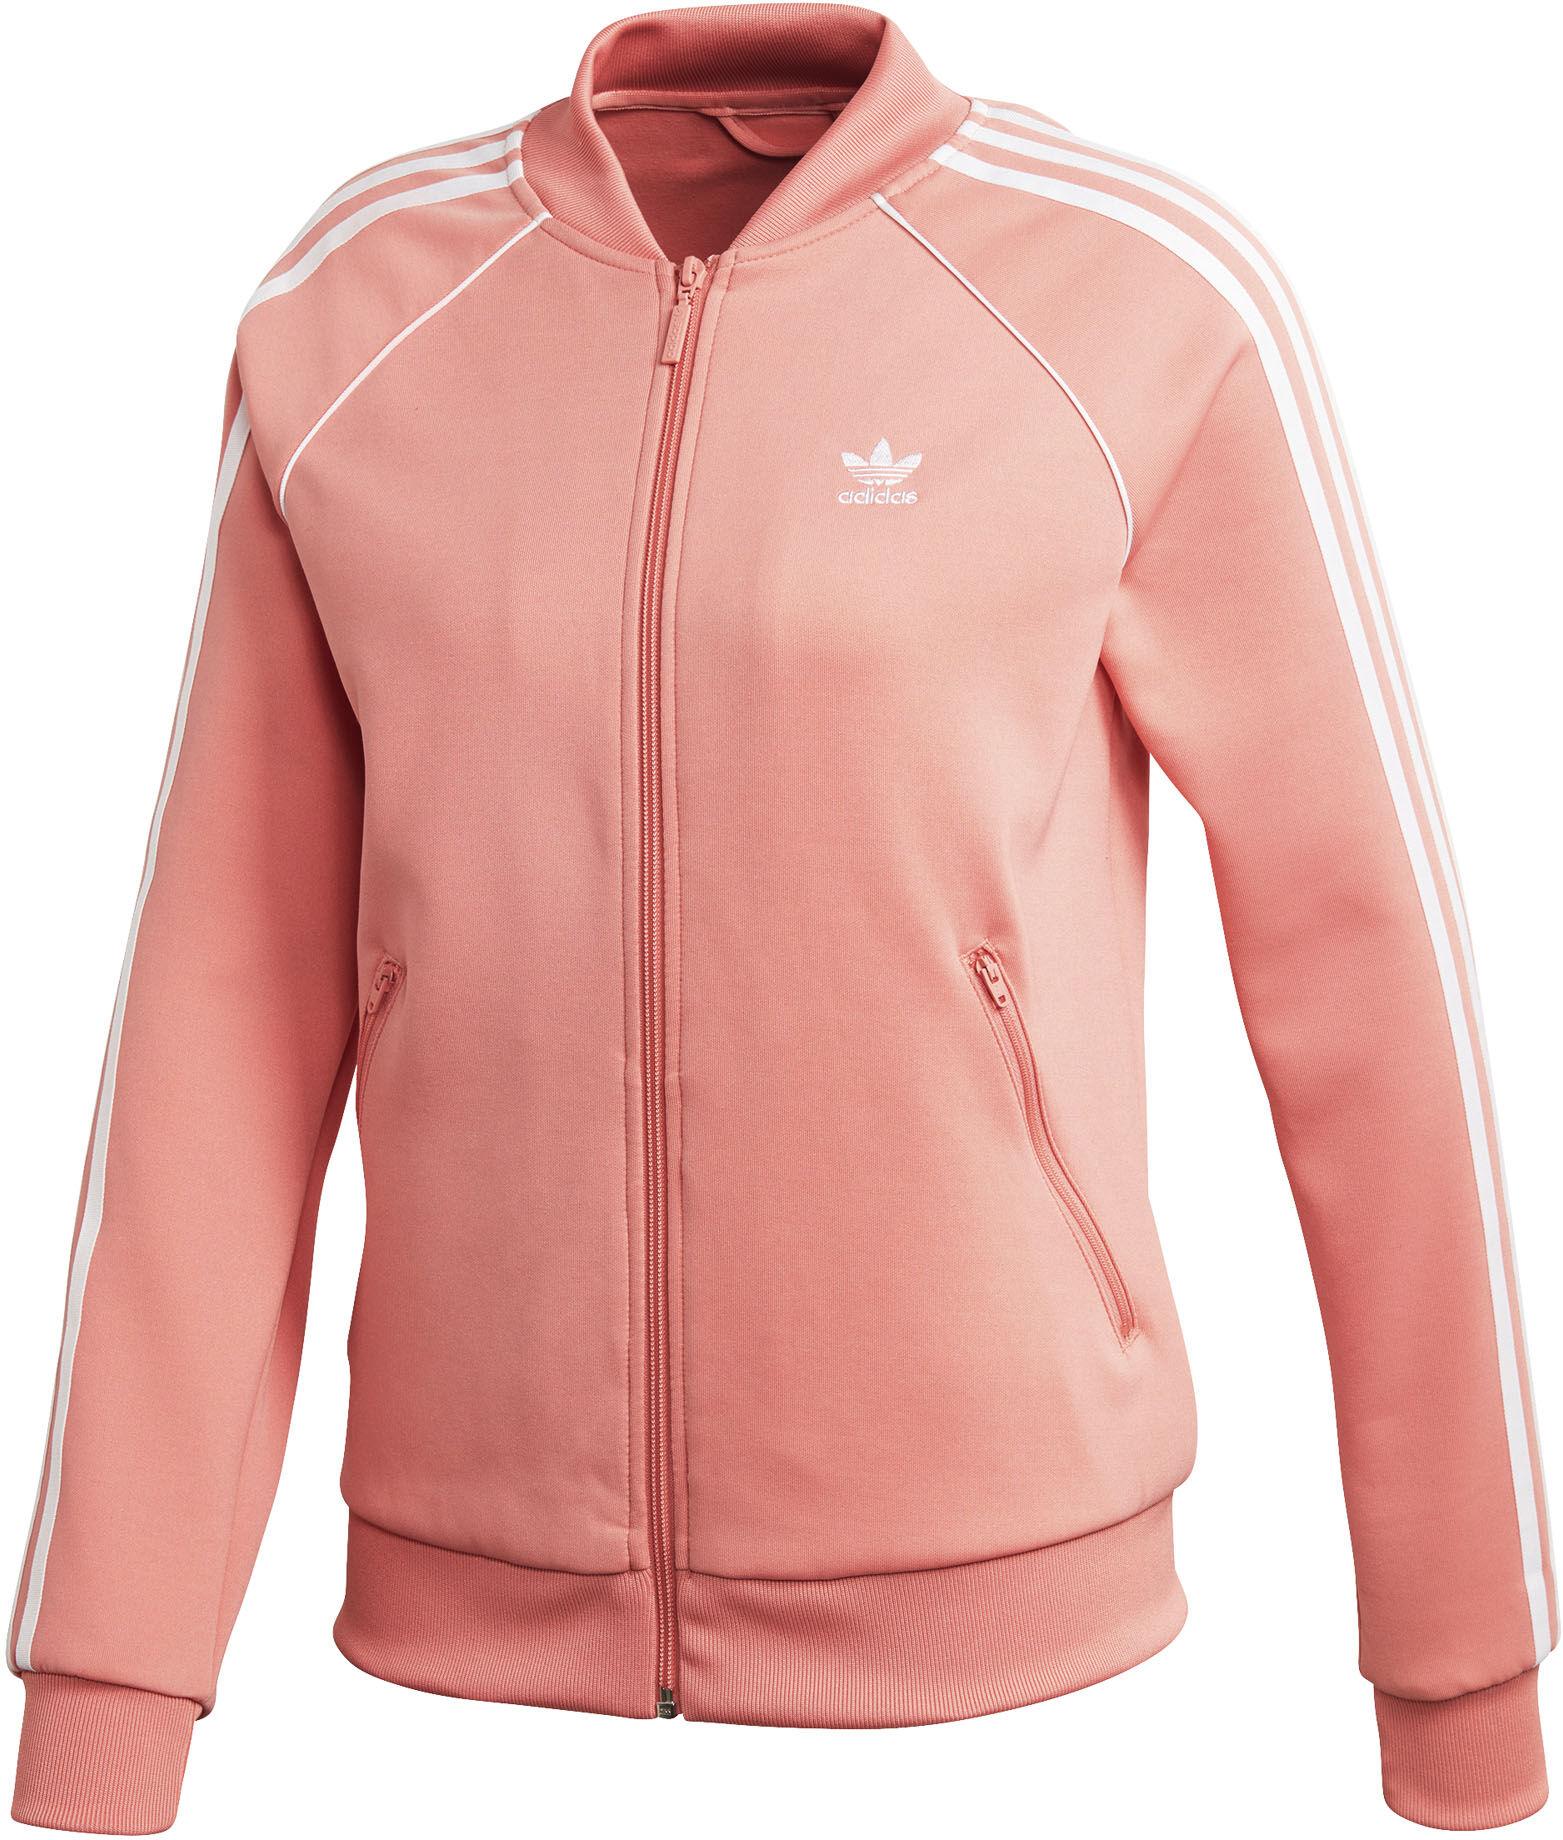 Adidas | The Athletes Foot